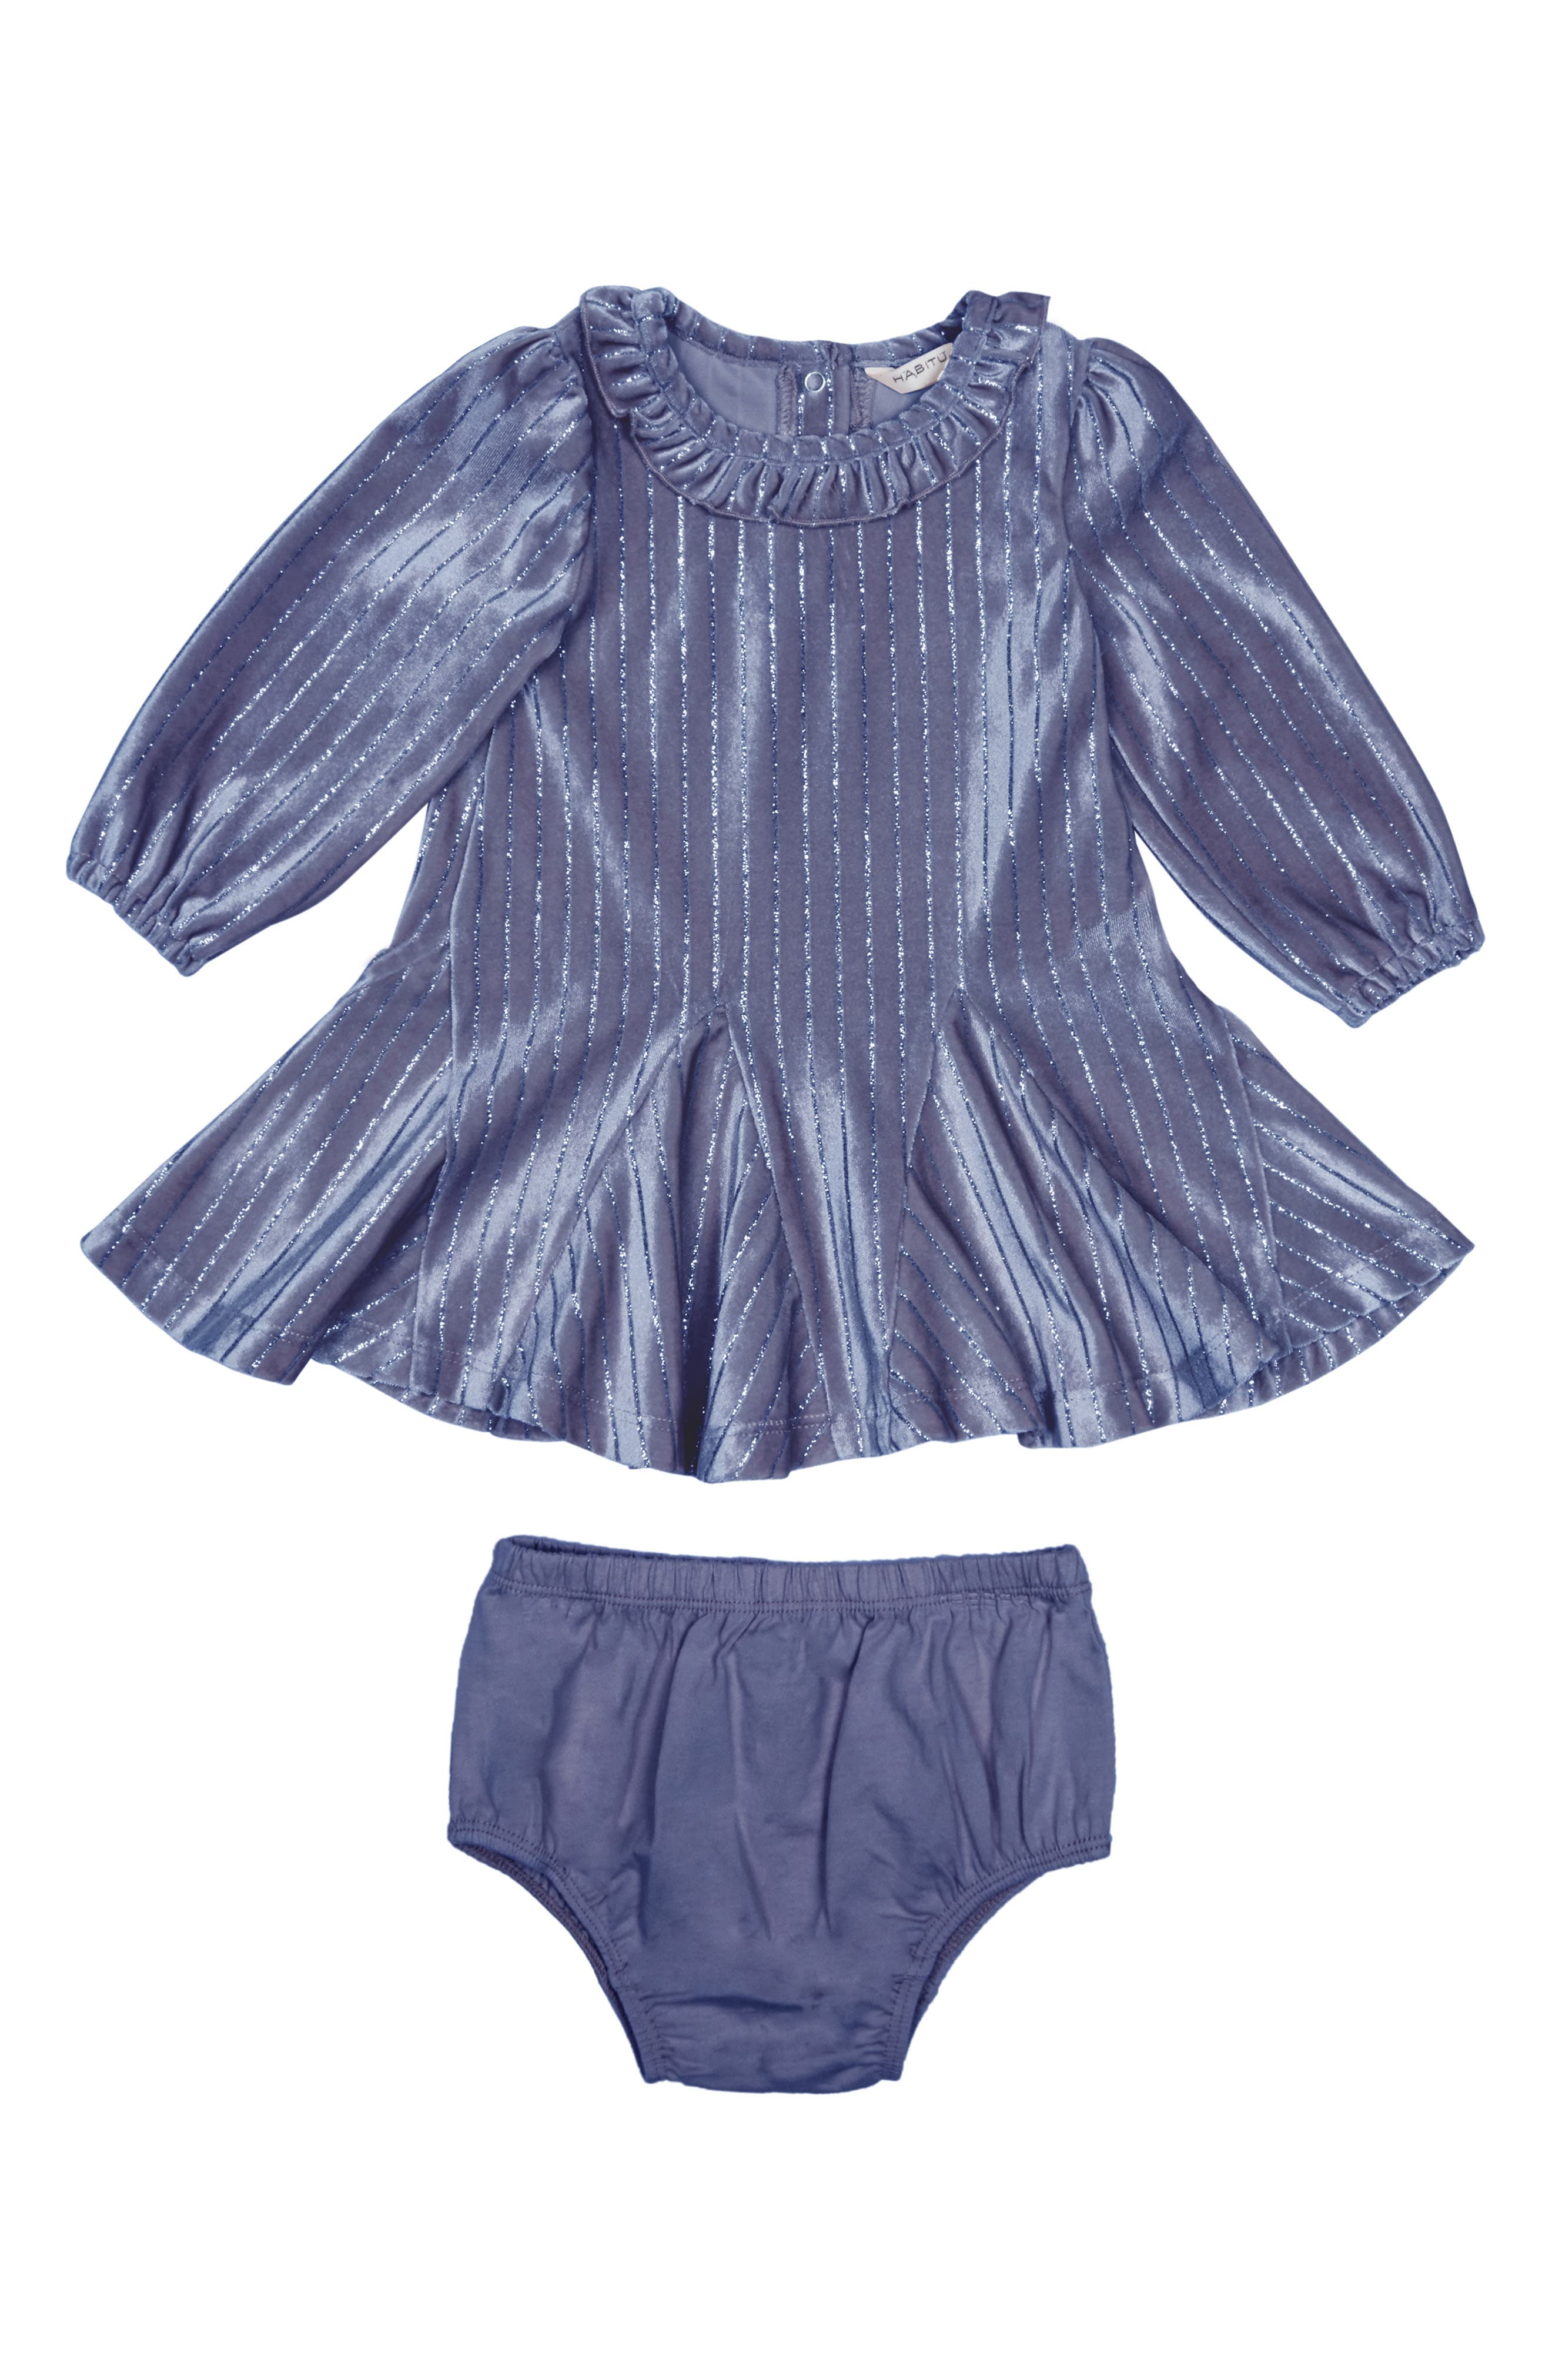 Cuekondy Newborn Infant Toddler Baby Girl 4th of July Stars Stripe Printed Tassel Backless Romper Bodysuit 3-24 Months